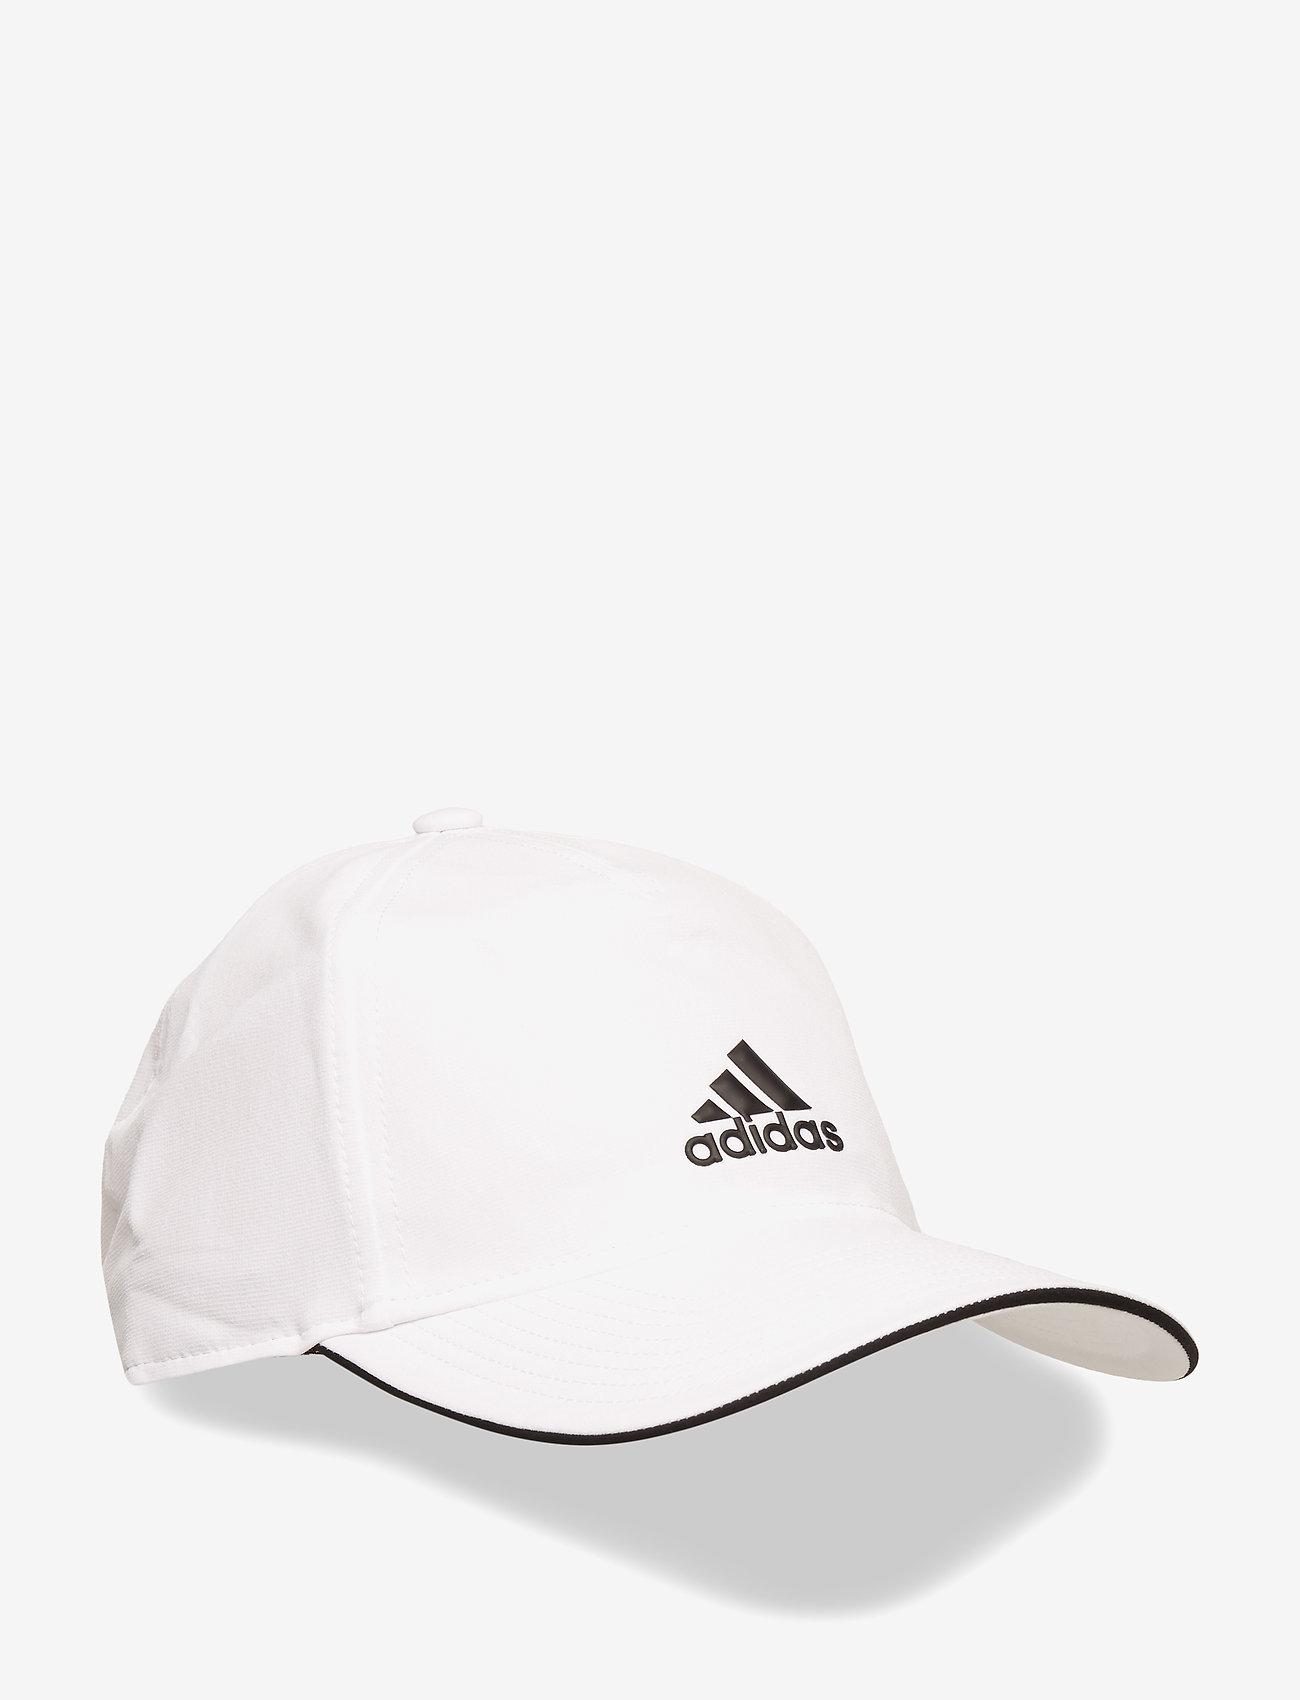 adidas Performance - C40 5PANEL CLIMALITE CAP - lakit - white - 0